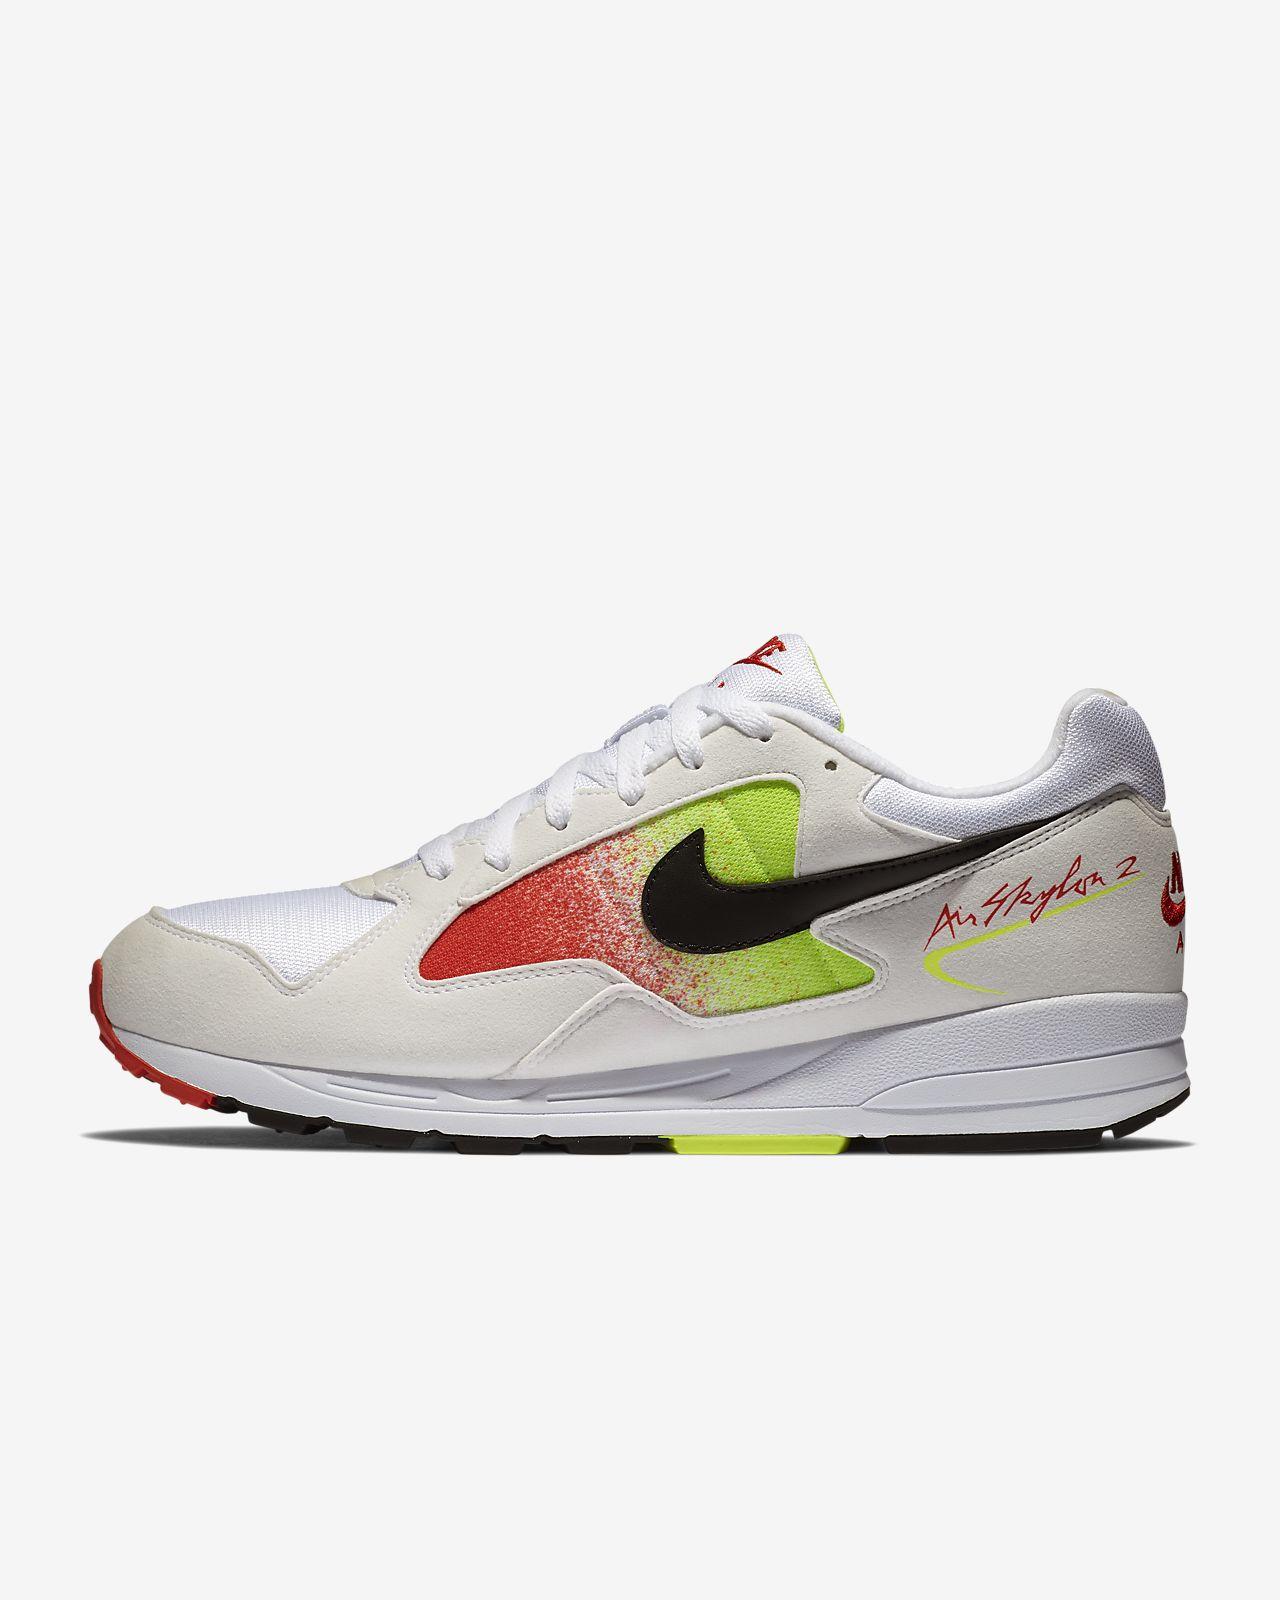 big sale 34bf9 09c55 ... Chaussure Nike Air Skylon II pour Homme